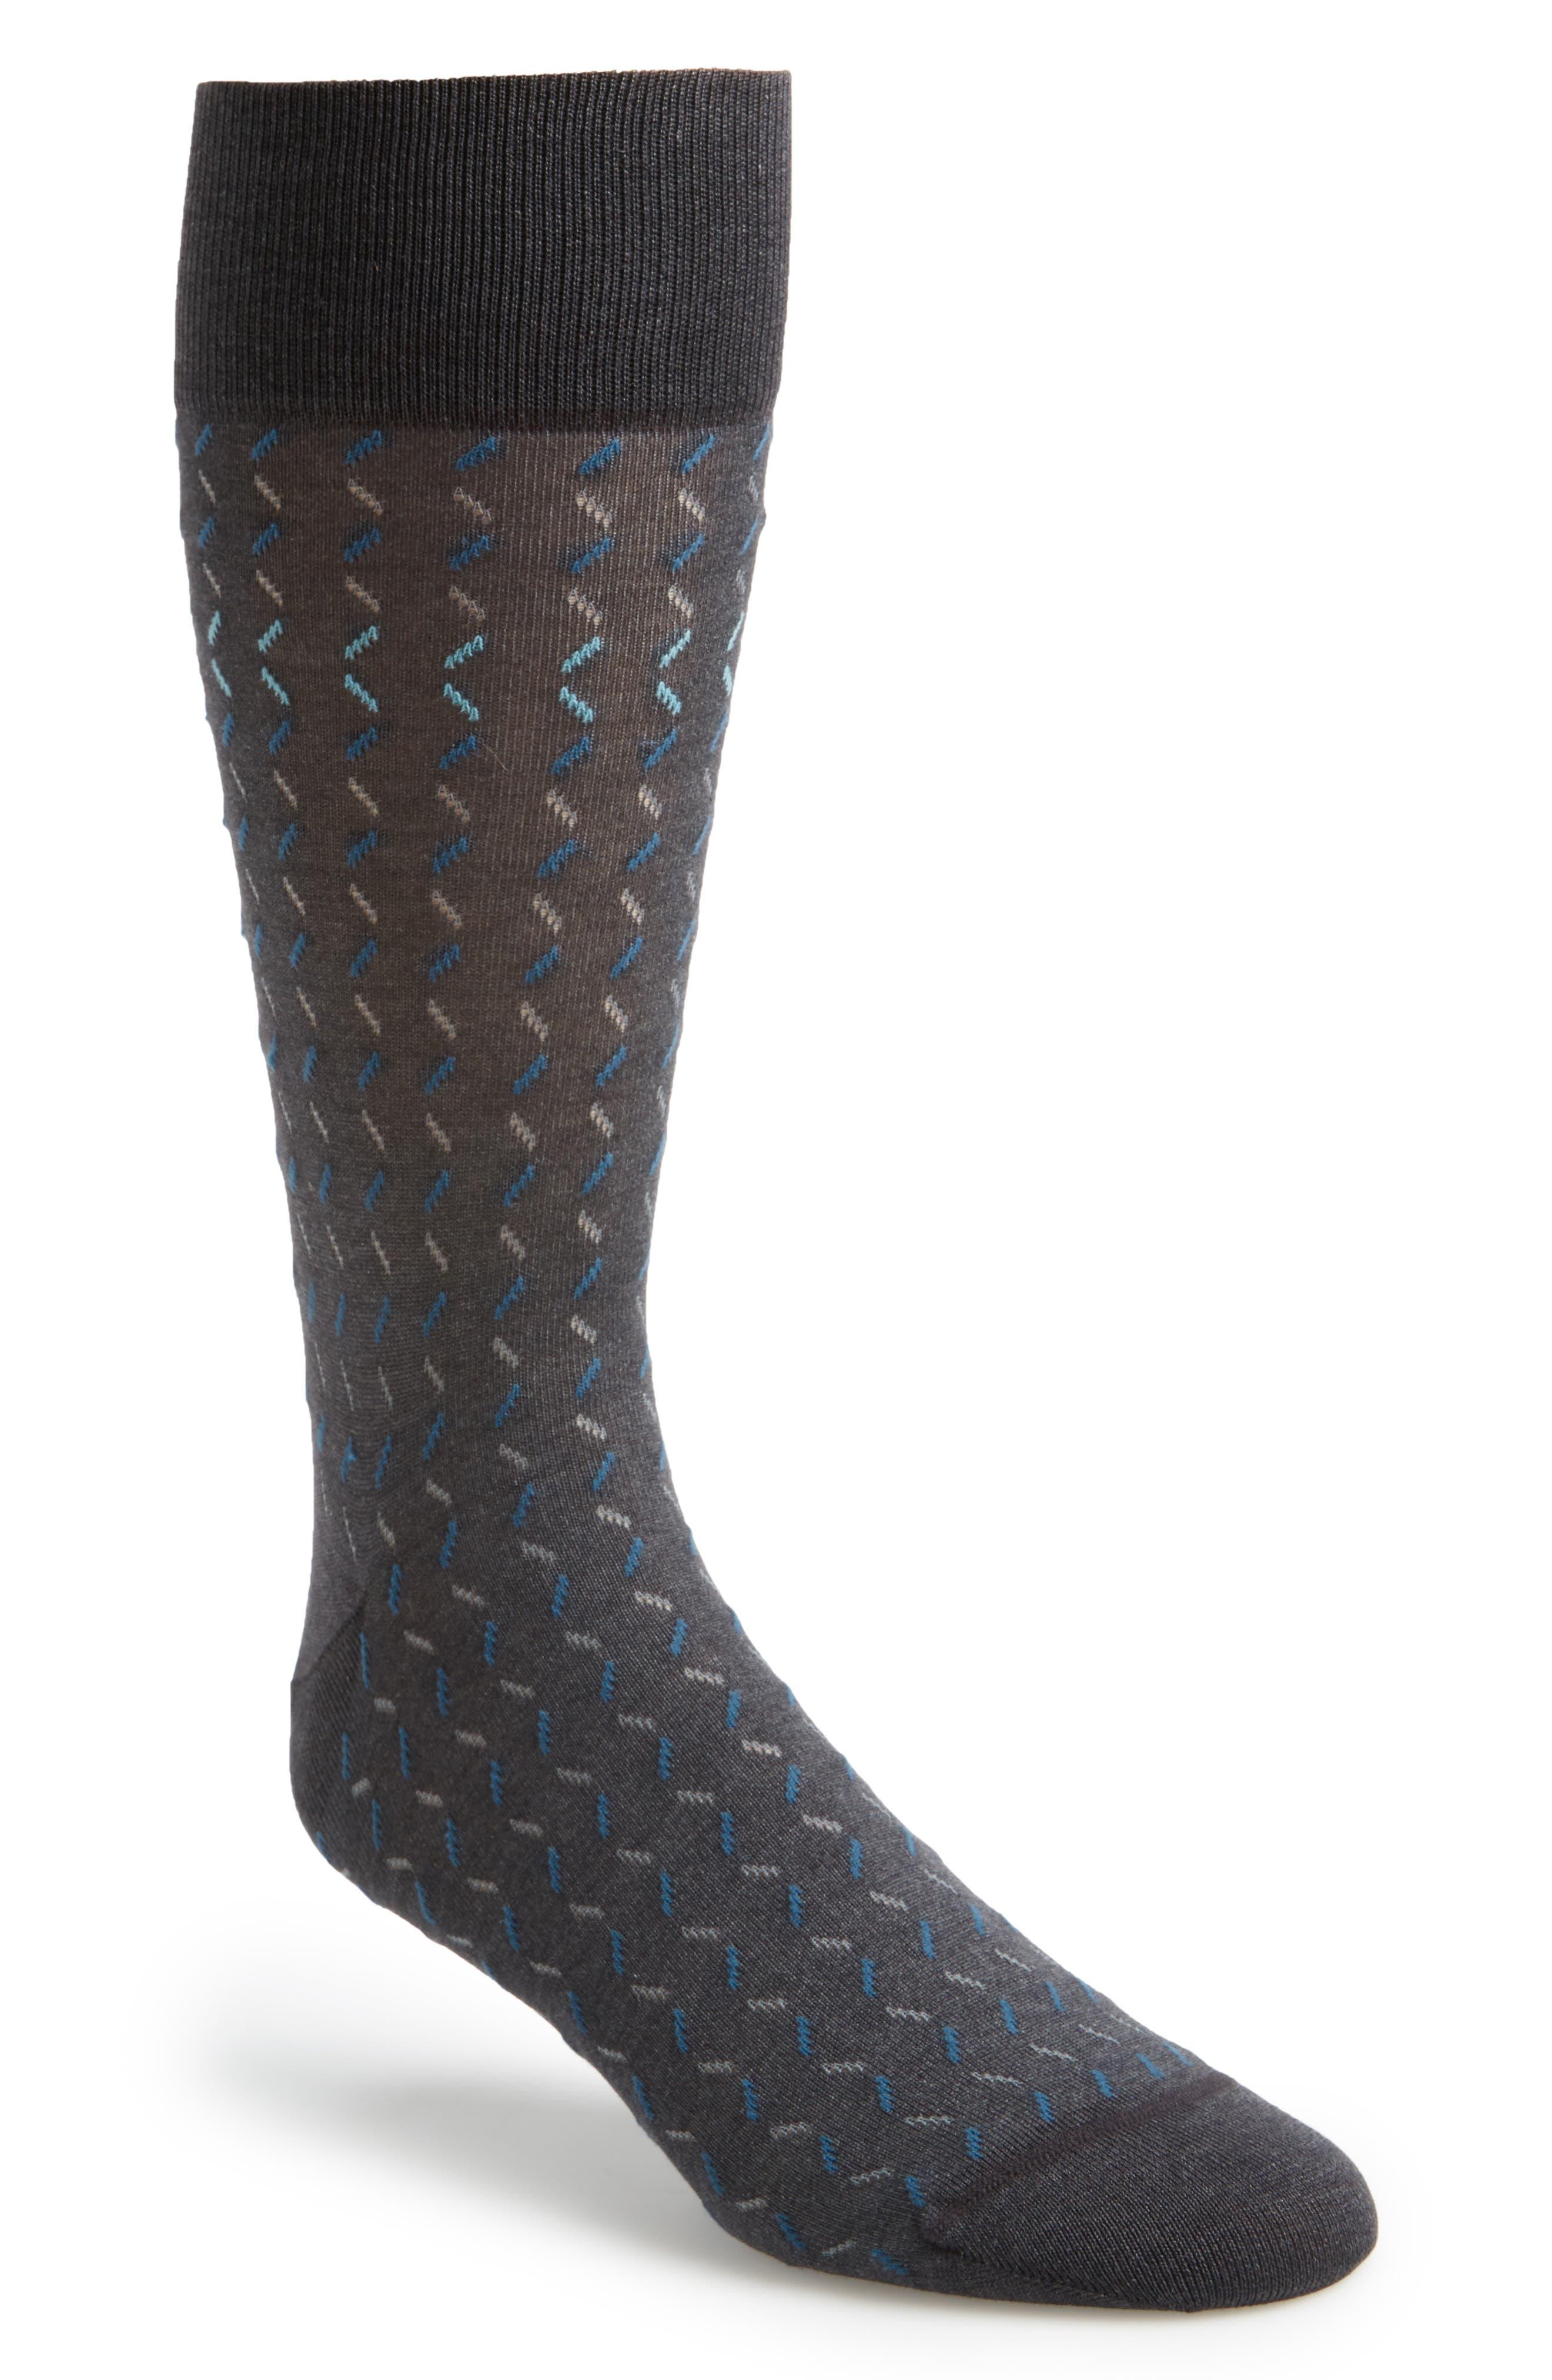 Dash Socks,                         Main,                         color, Charcoal/ Teal